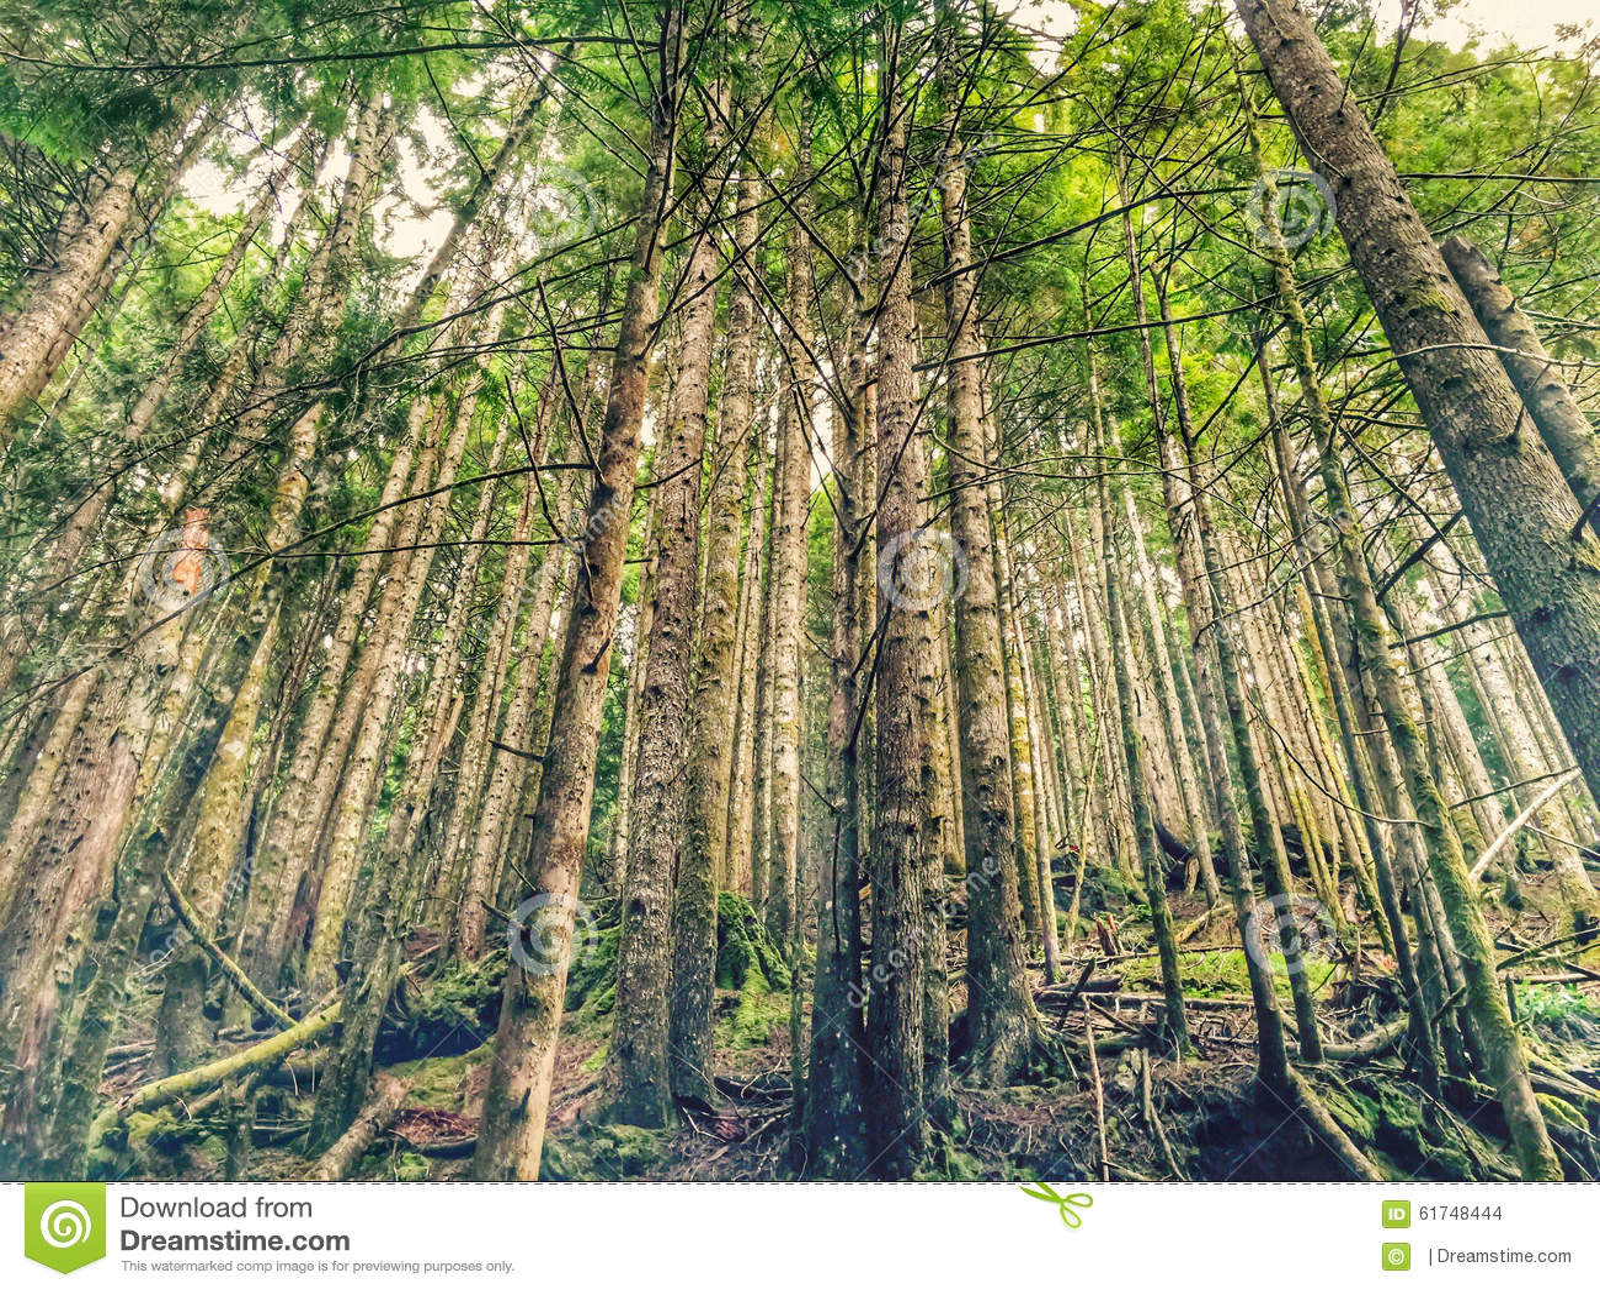 washington evergreen tree line drawing - Google Search ... |Washington Evergreen Trees